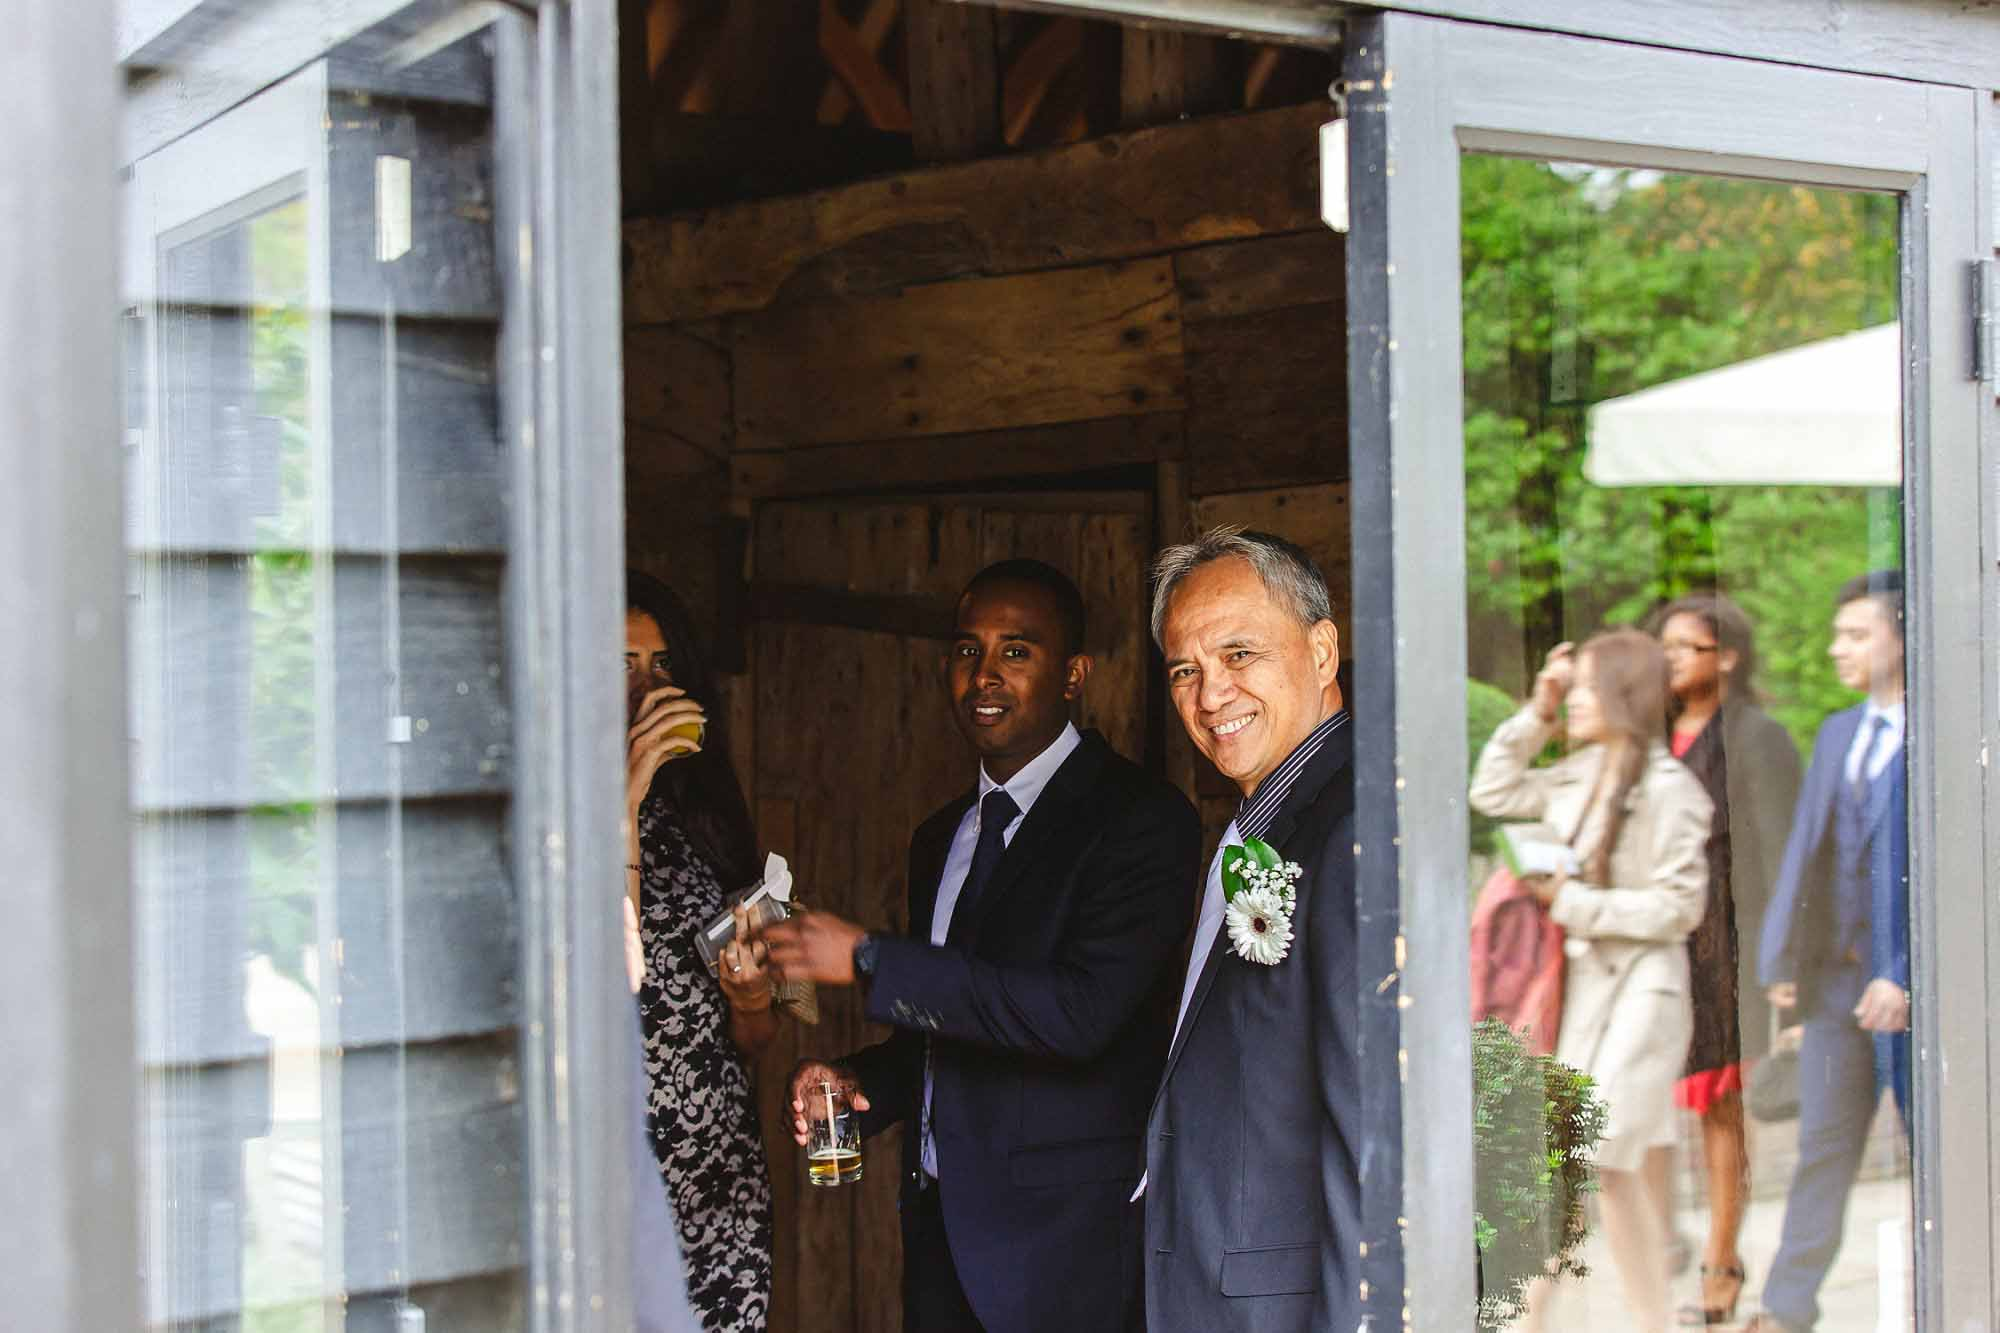 Blake-Hall-Wedding-Photographer_0072.jpg